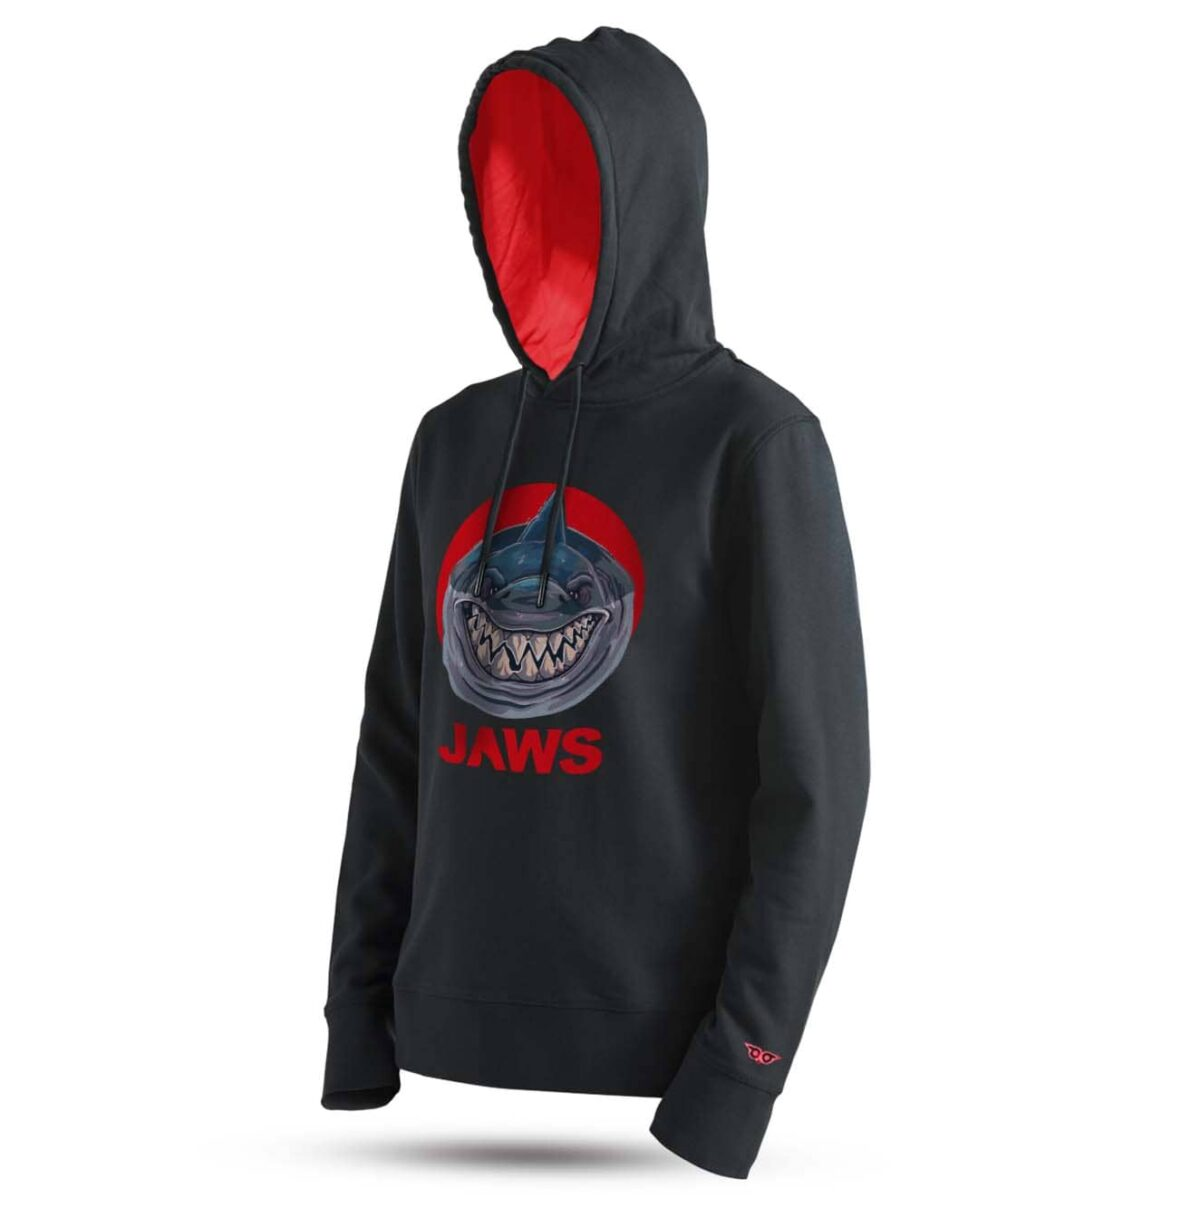 tarrzz-tasarim-kapsonlu-sweatshirt-kopekbalikli-jaws-baskili-sweatshirt